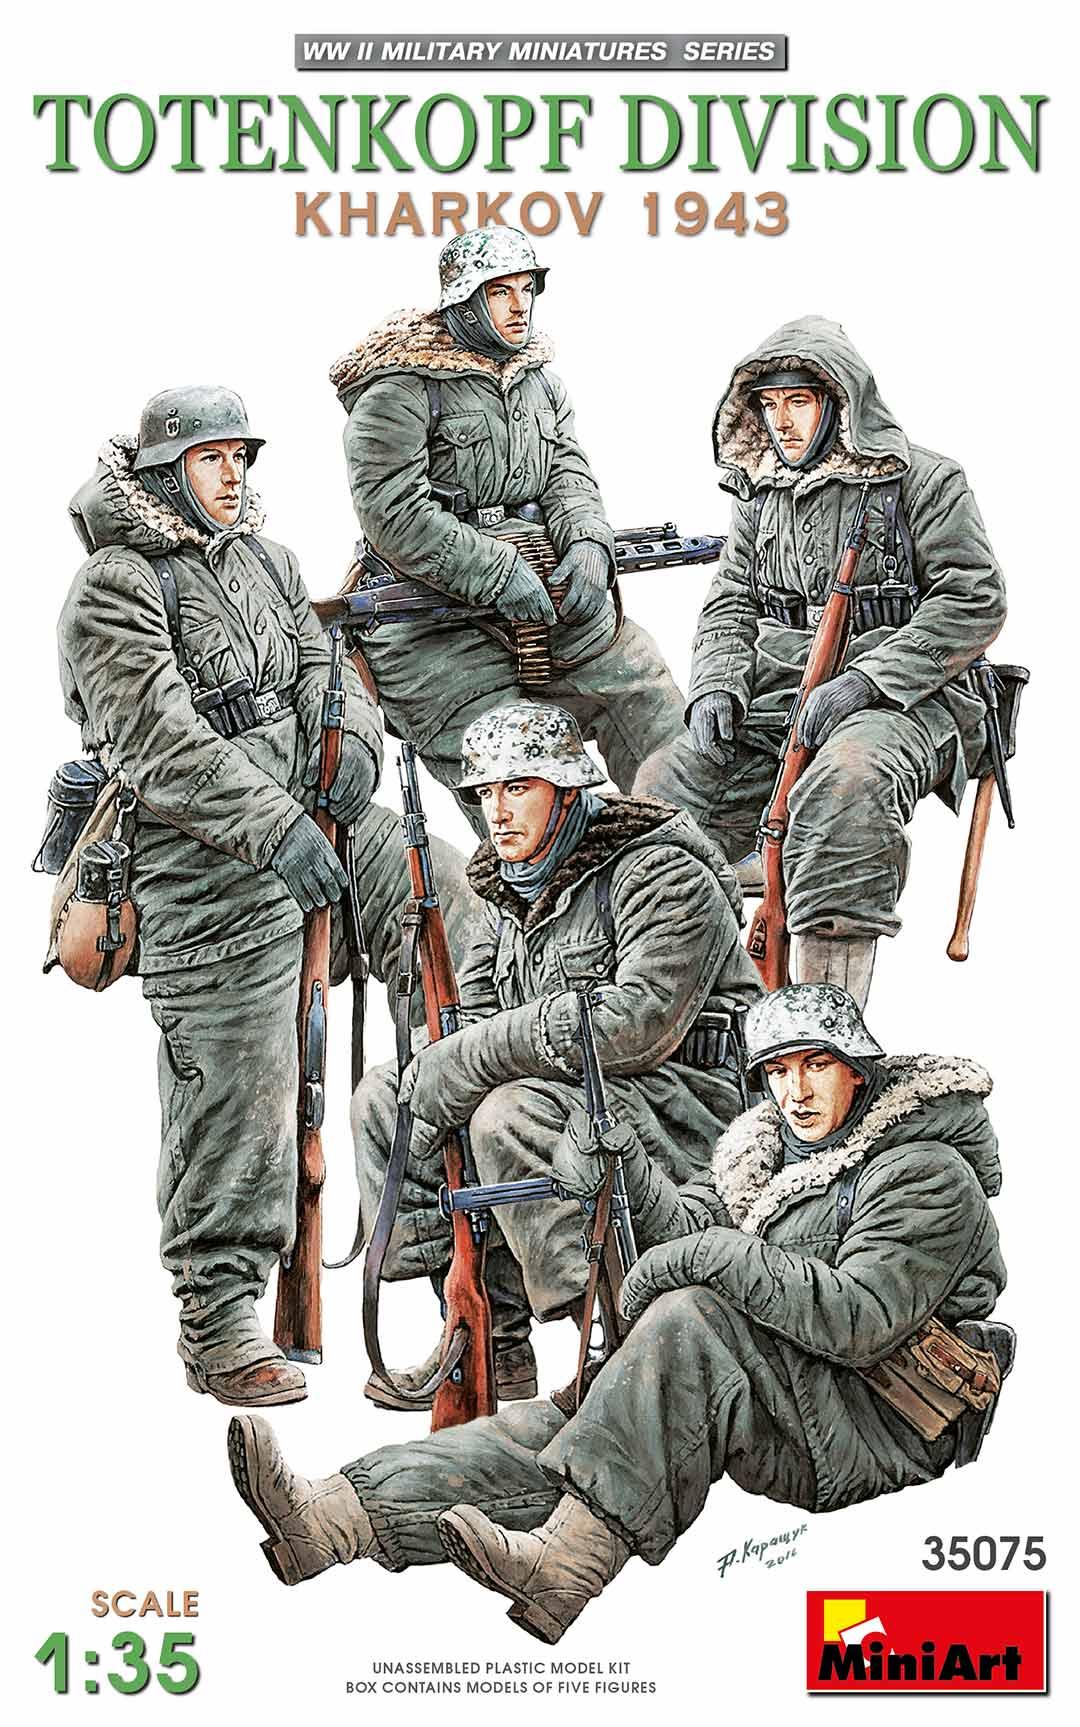 Miniart Totenkopf Division ( Kharkov 1943 ) (1/35)